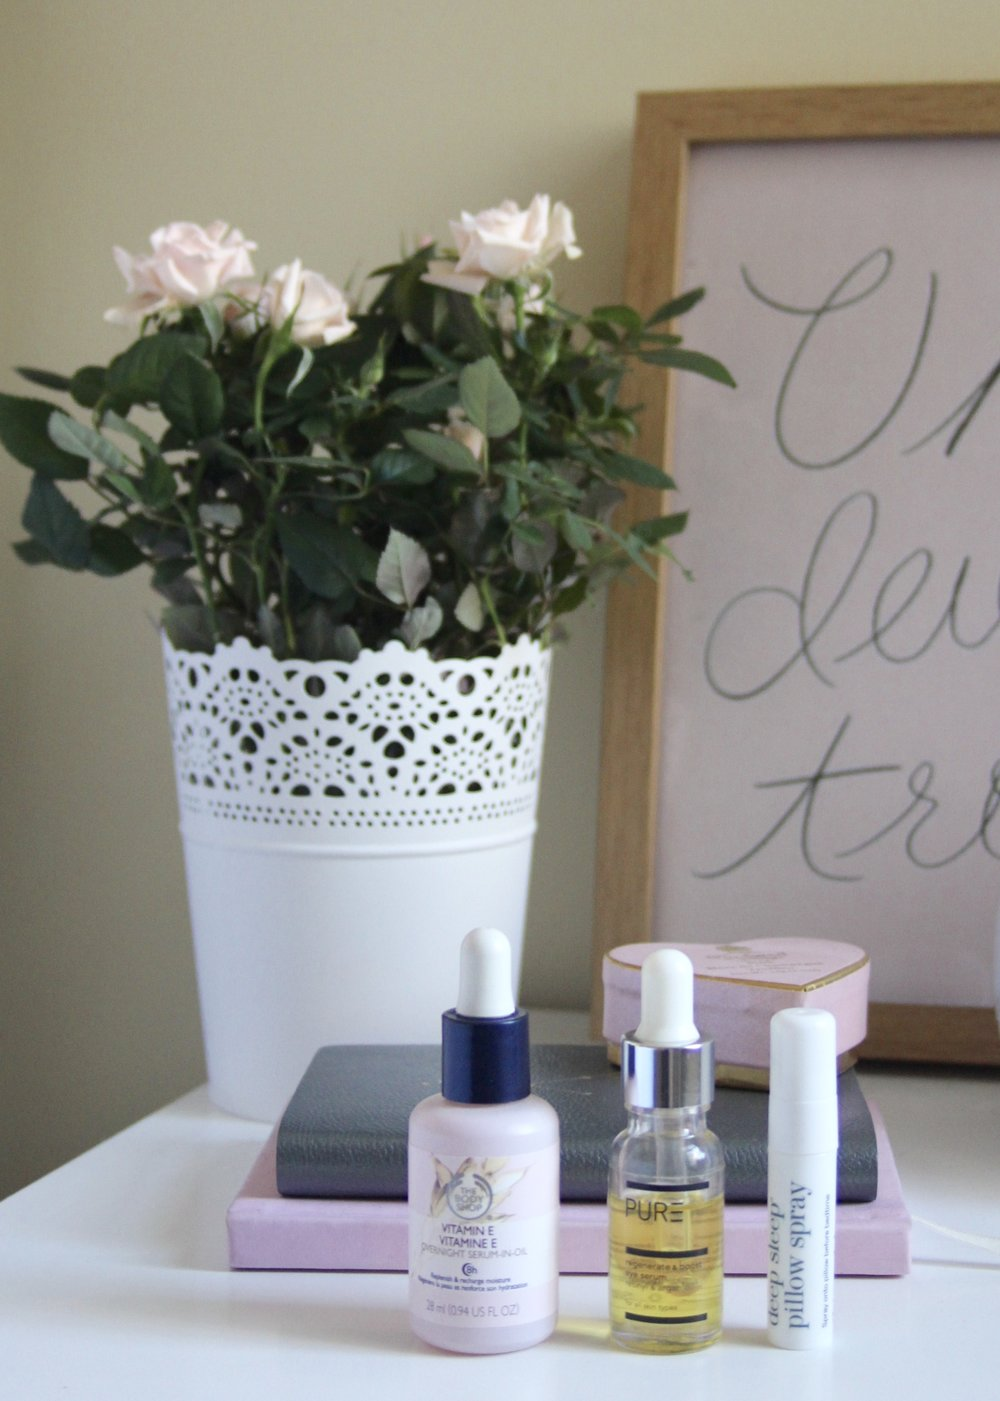 Bedside Skincare, Body Shop serum, Pure Spa eye serum, This Works pillow spray